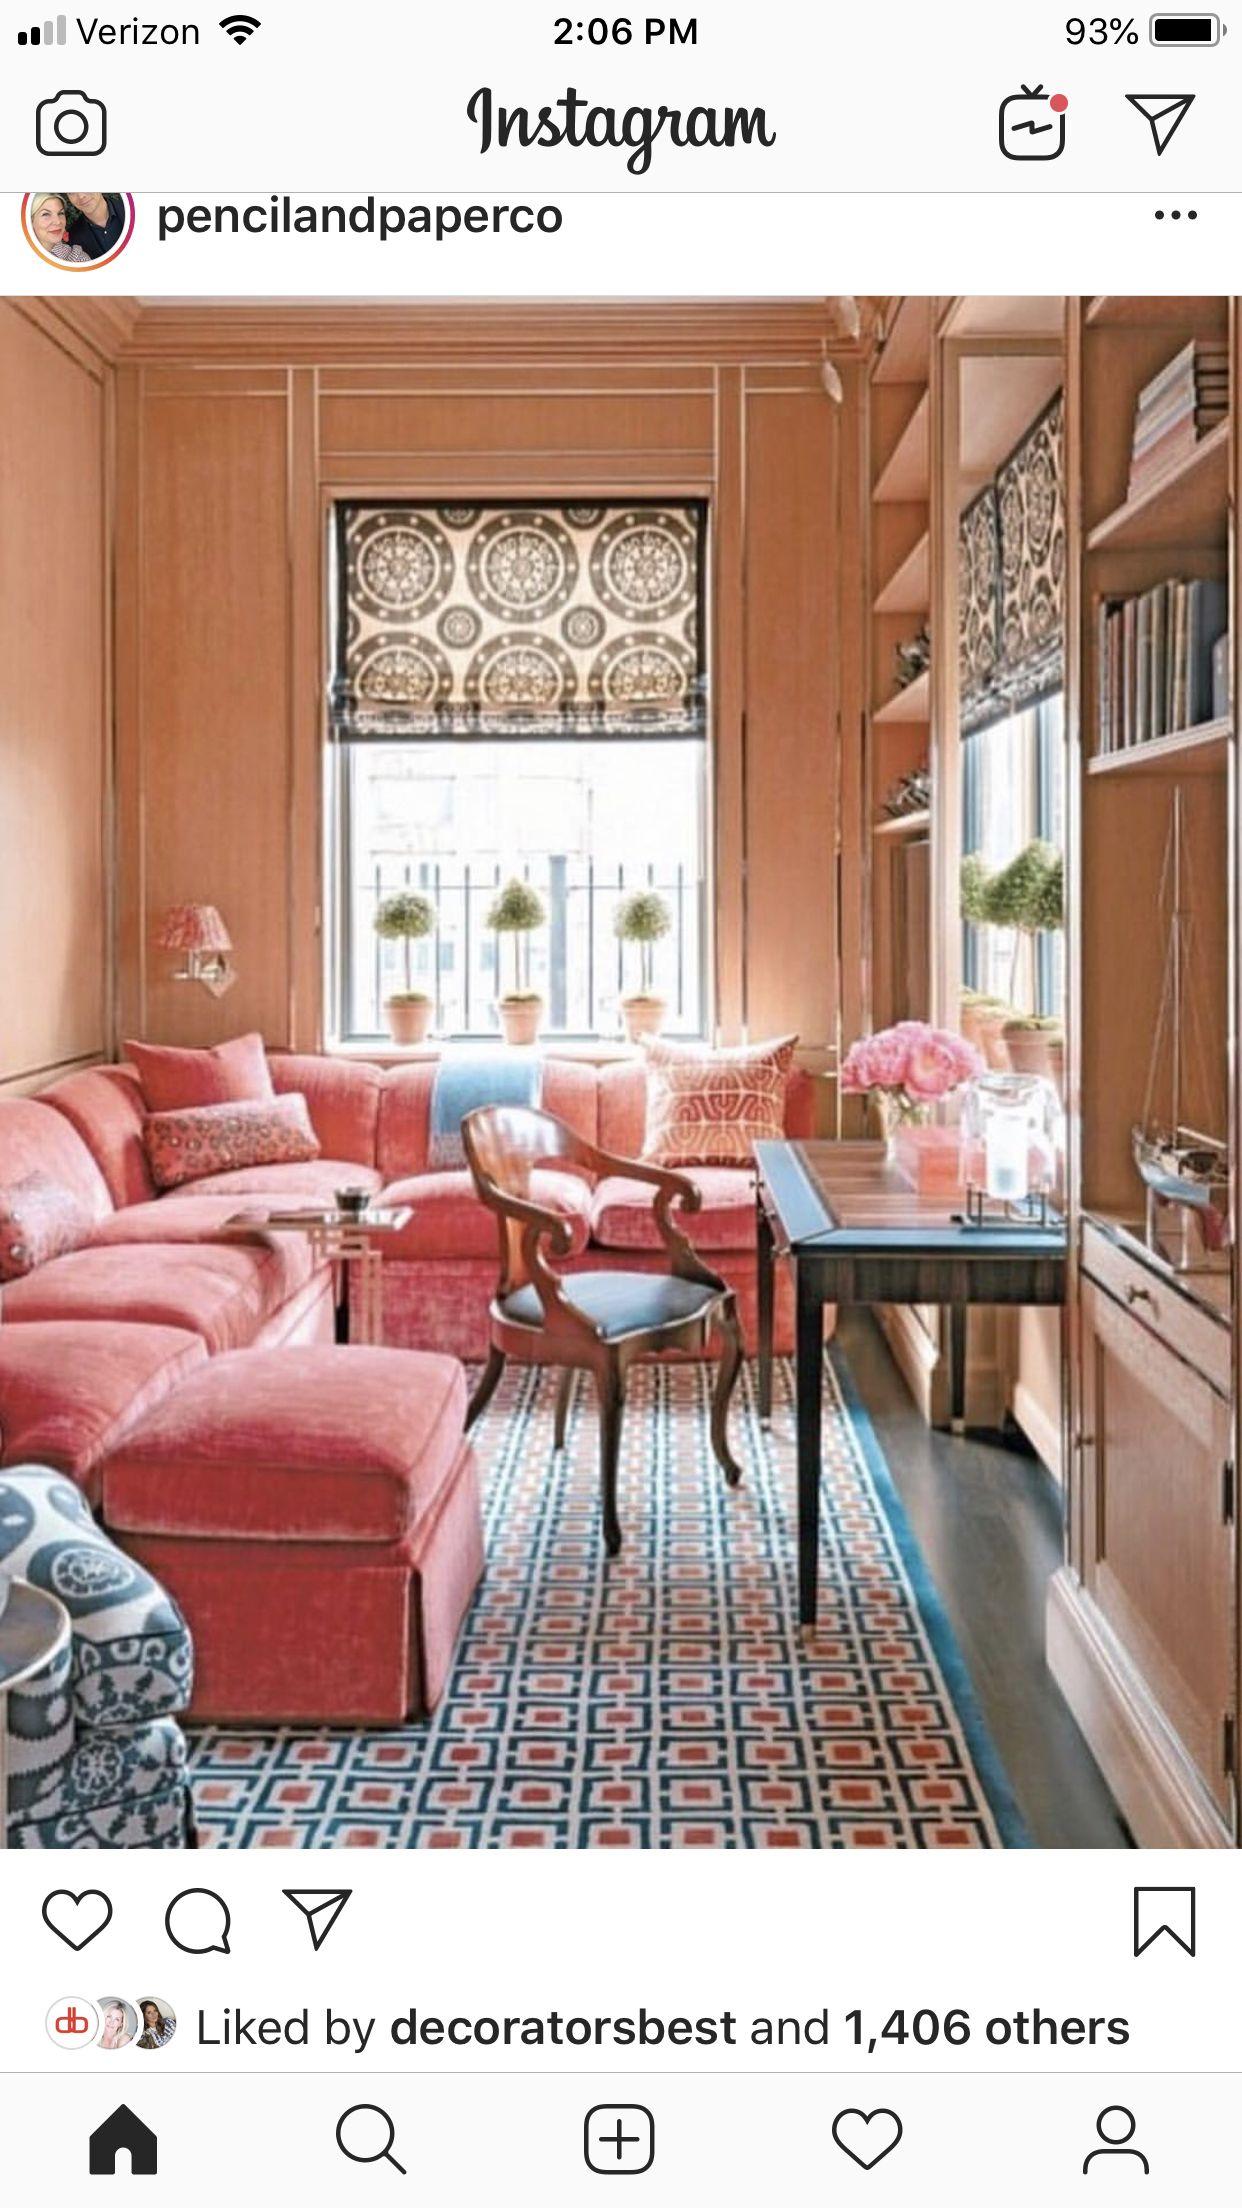 Color Palette And Details Interior Home Decor Interior Design